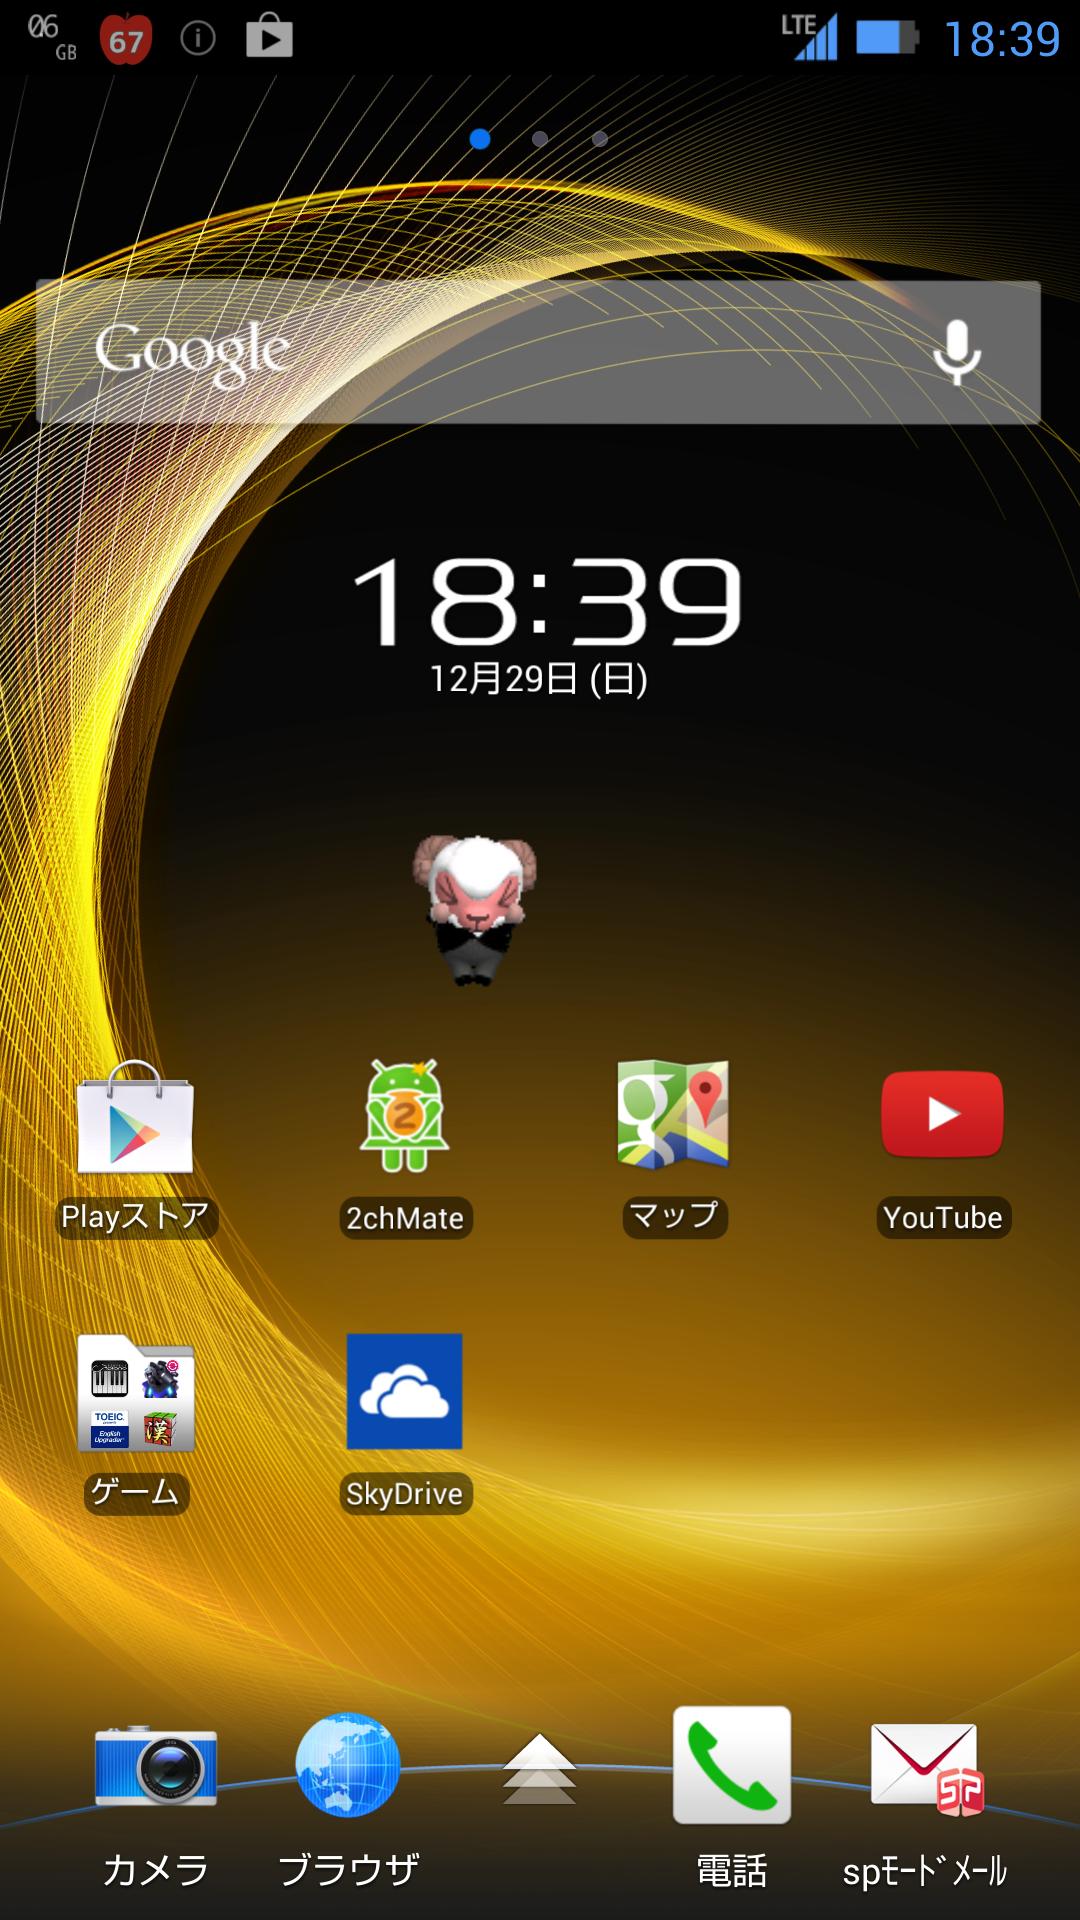 Screenshot_2013-12-29-18-39-56.png